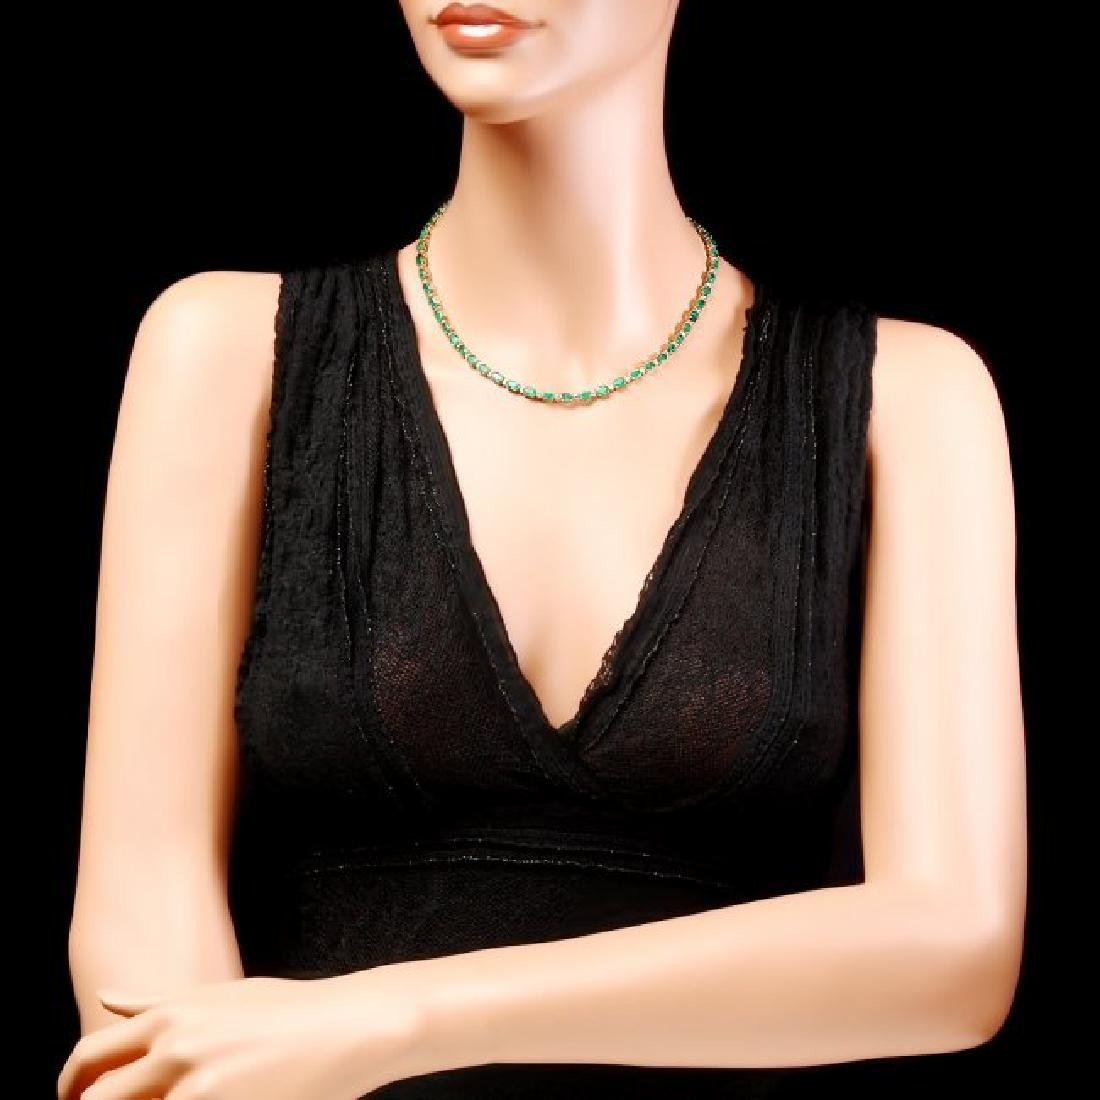 14k Gold 23ct Emerald 1.55ct Diamond Necklace - 4